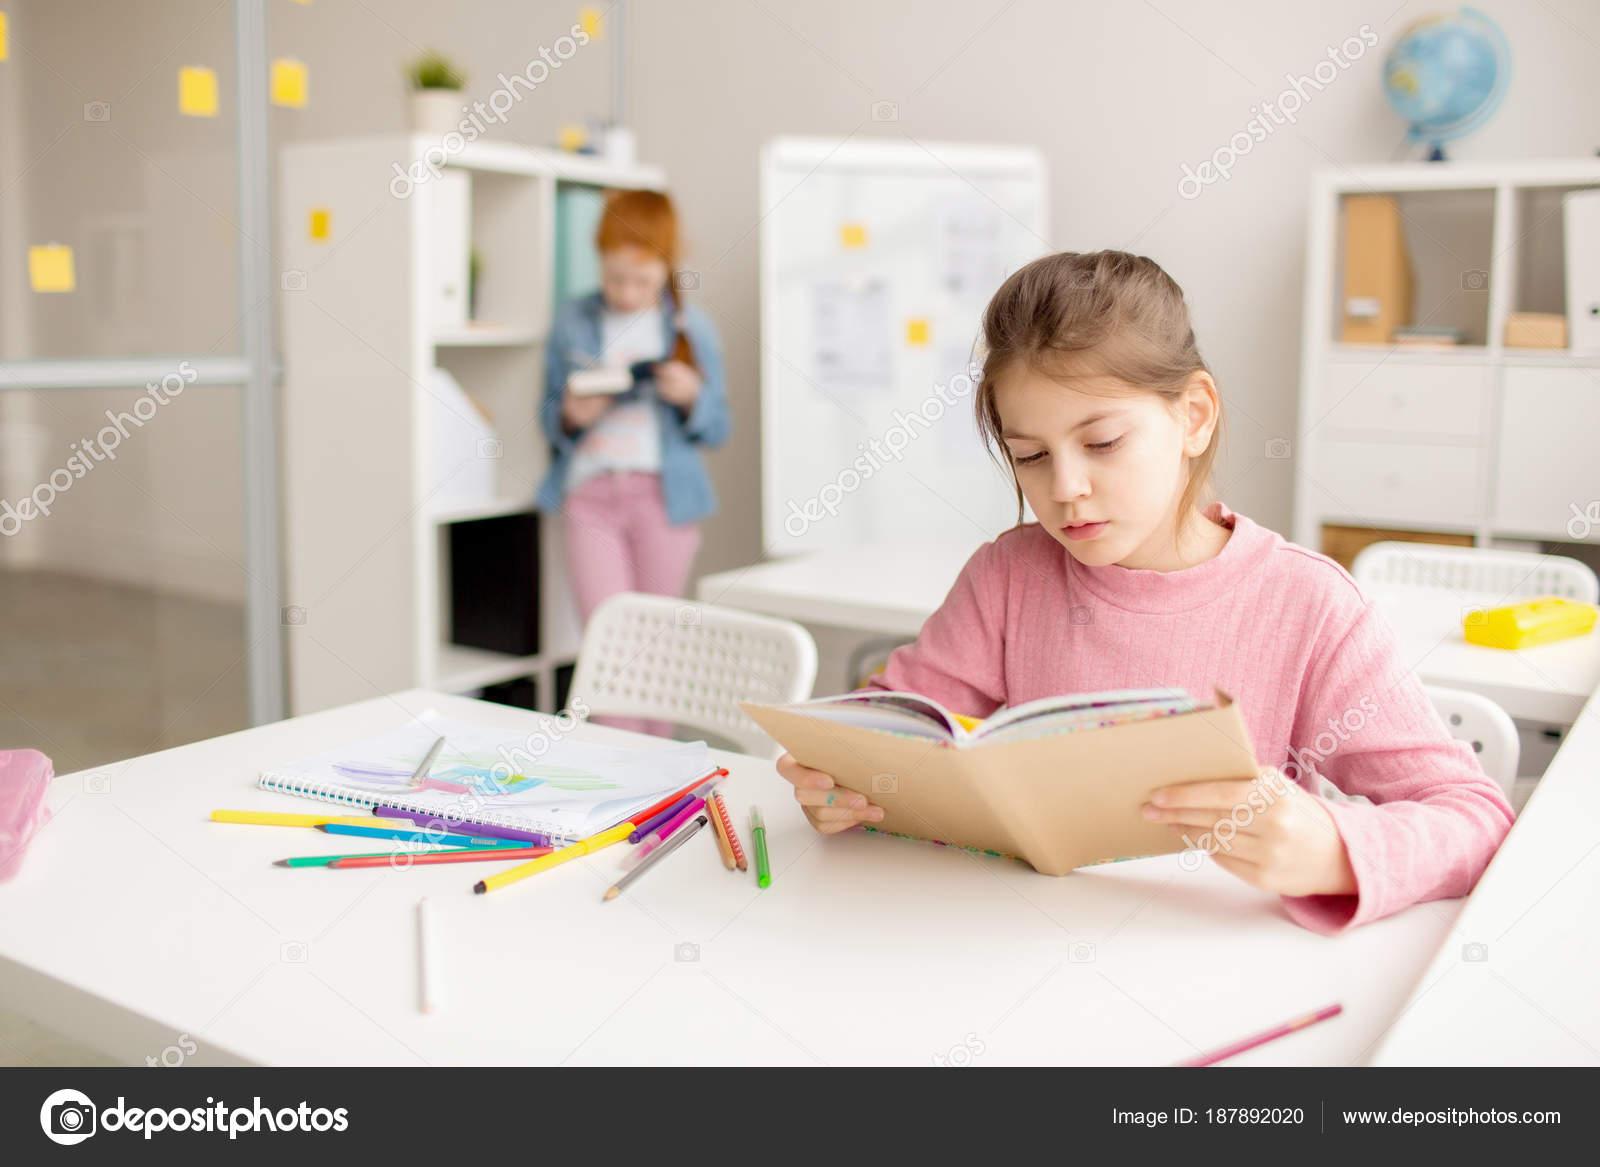 61cccc607514 Σοβαρή μαθήτρια ανάγνωση ενδιαφέρον βιβλίο στη βιβλιοθήκη του σχολείου